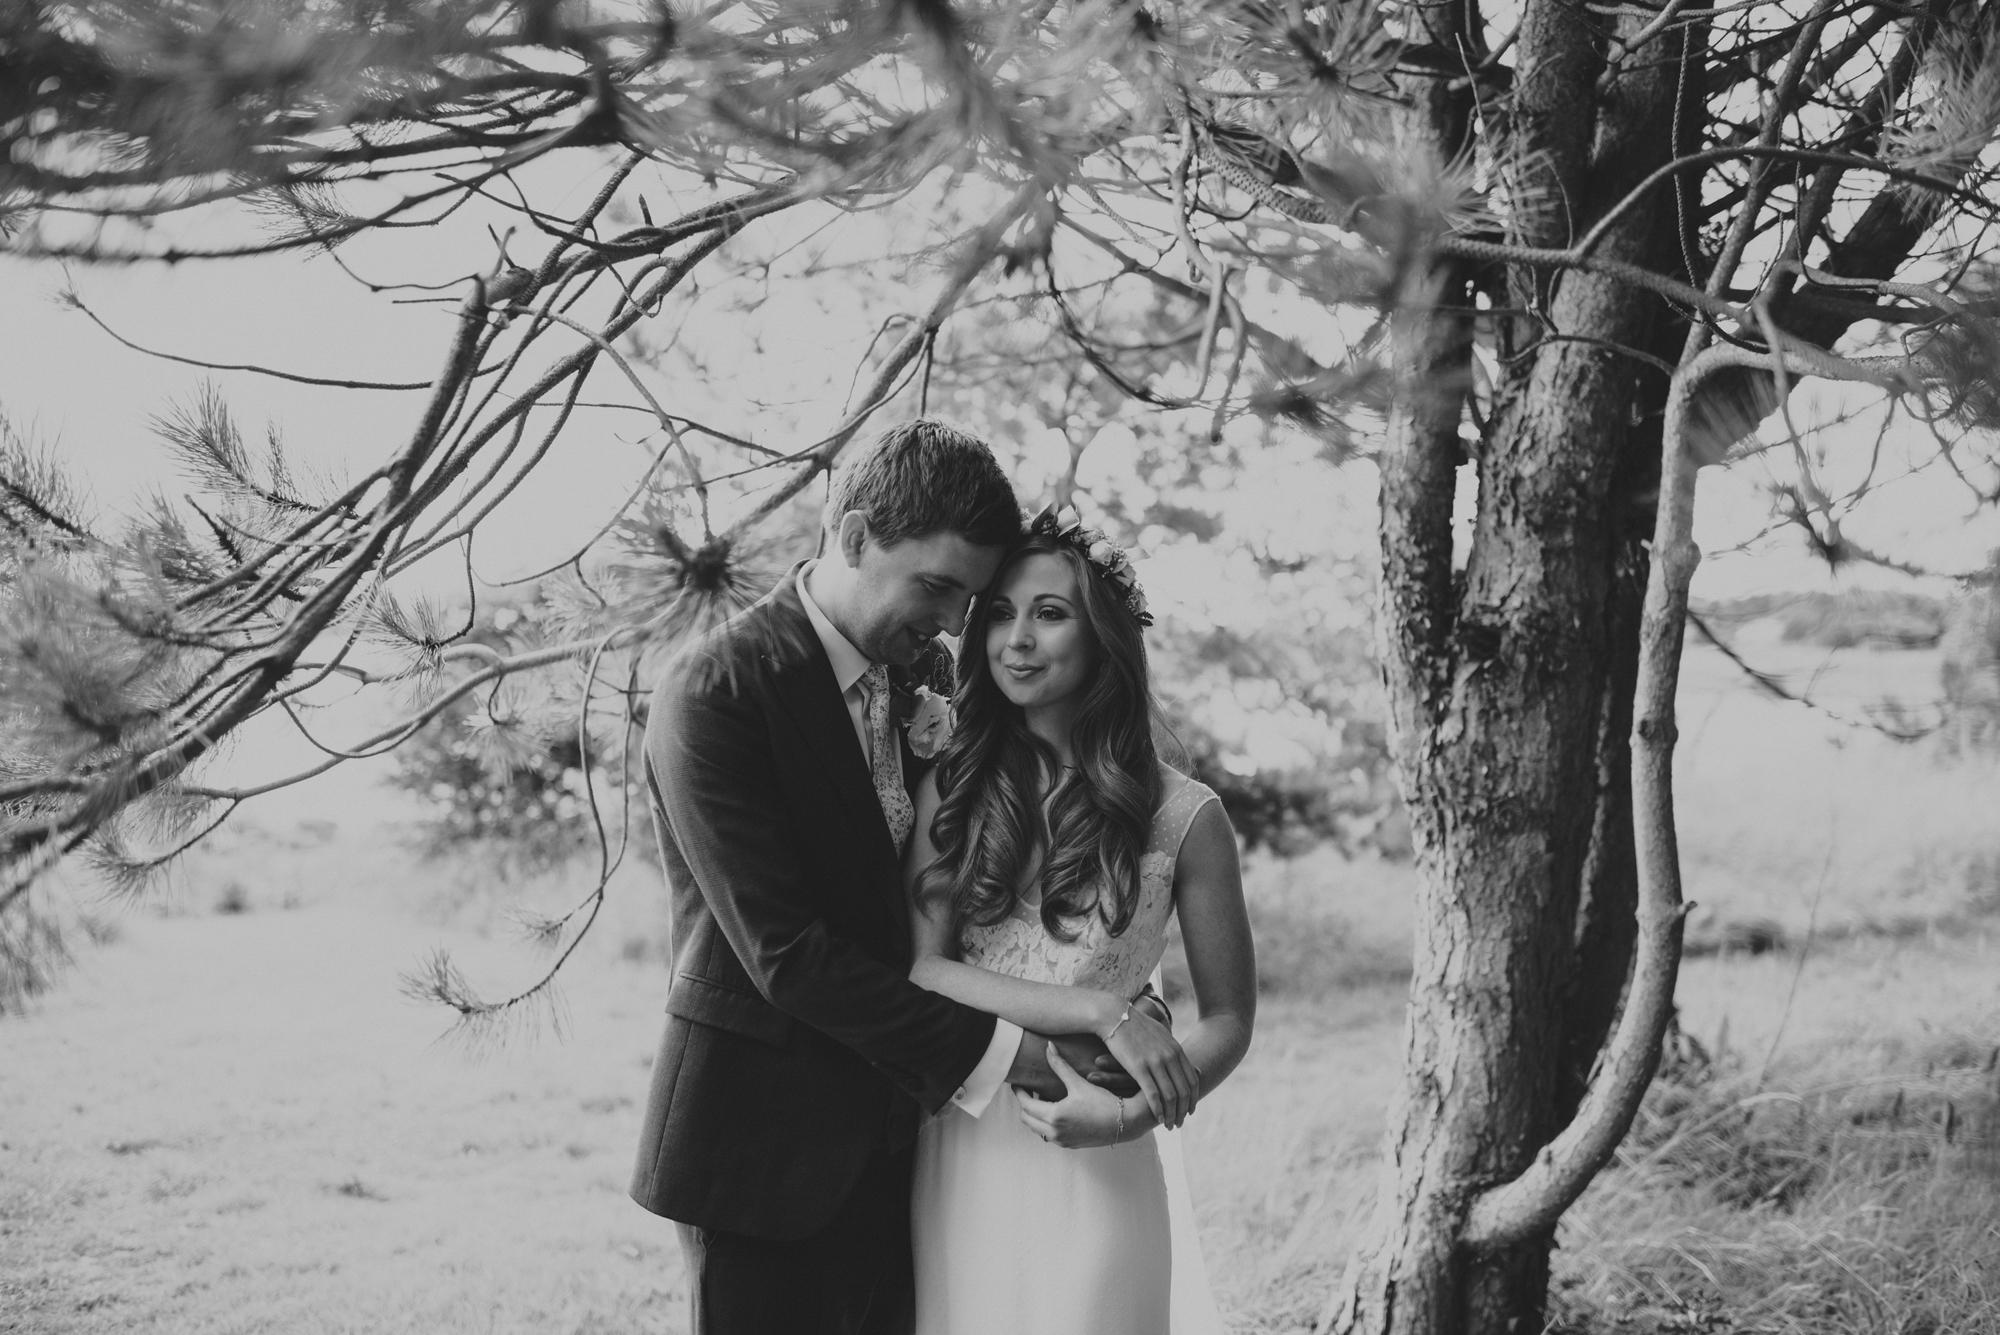 Orange_tree_house_Wedding_you_them_us_inspire_Weddings_30.jpg